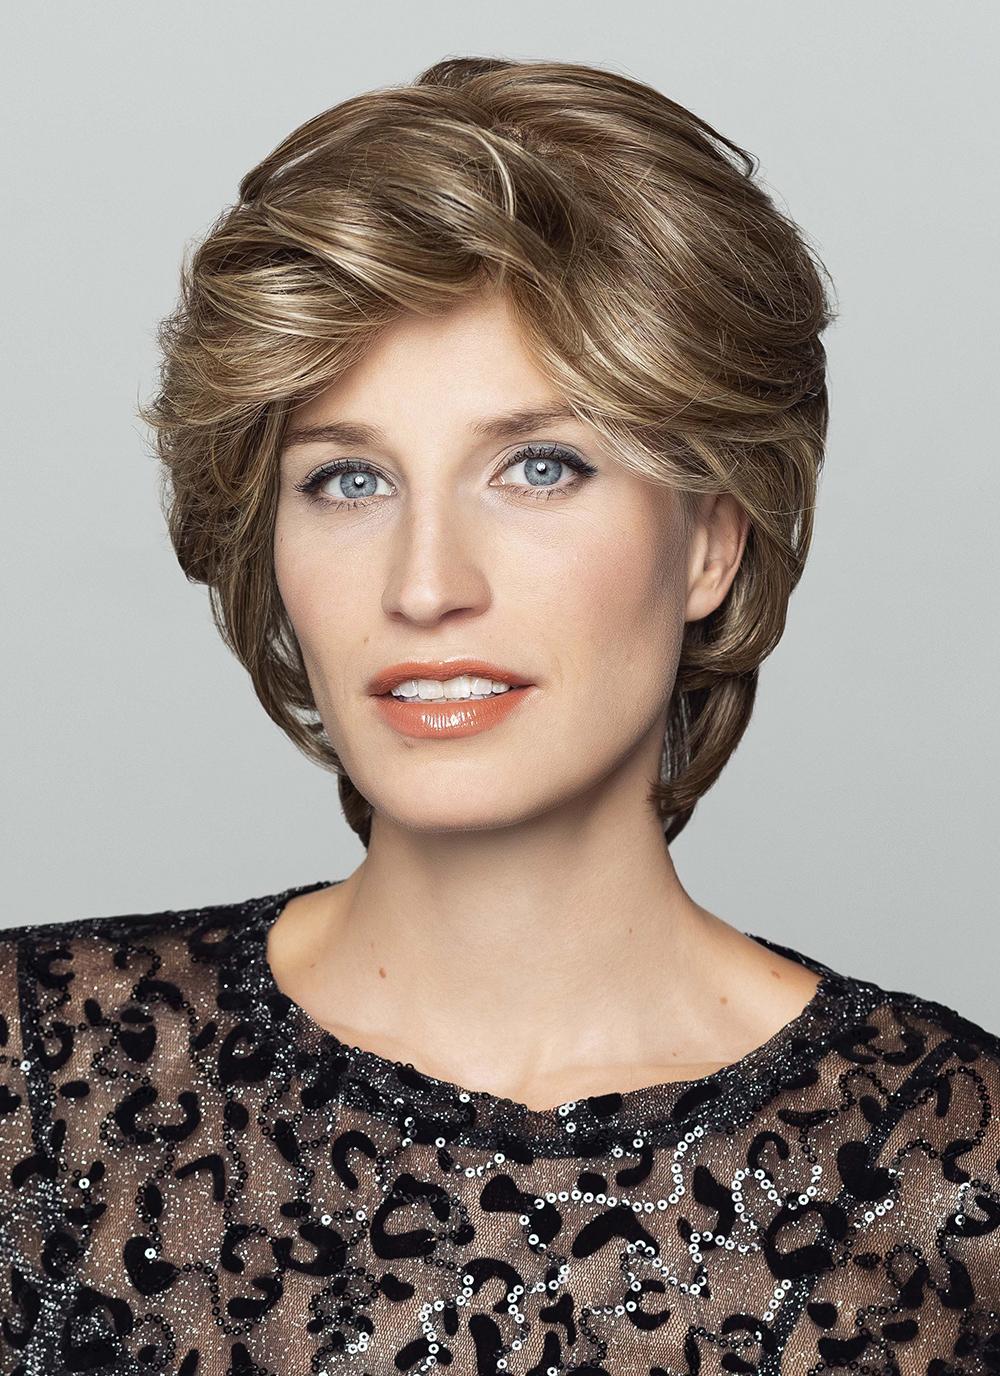 Gisela Mayer Perücke: Duo Fiber - Kylie